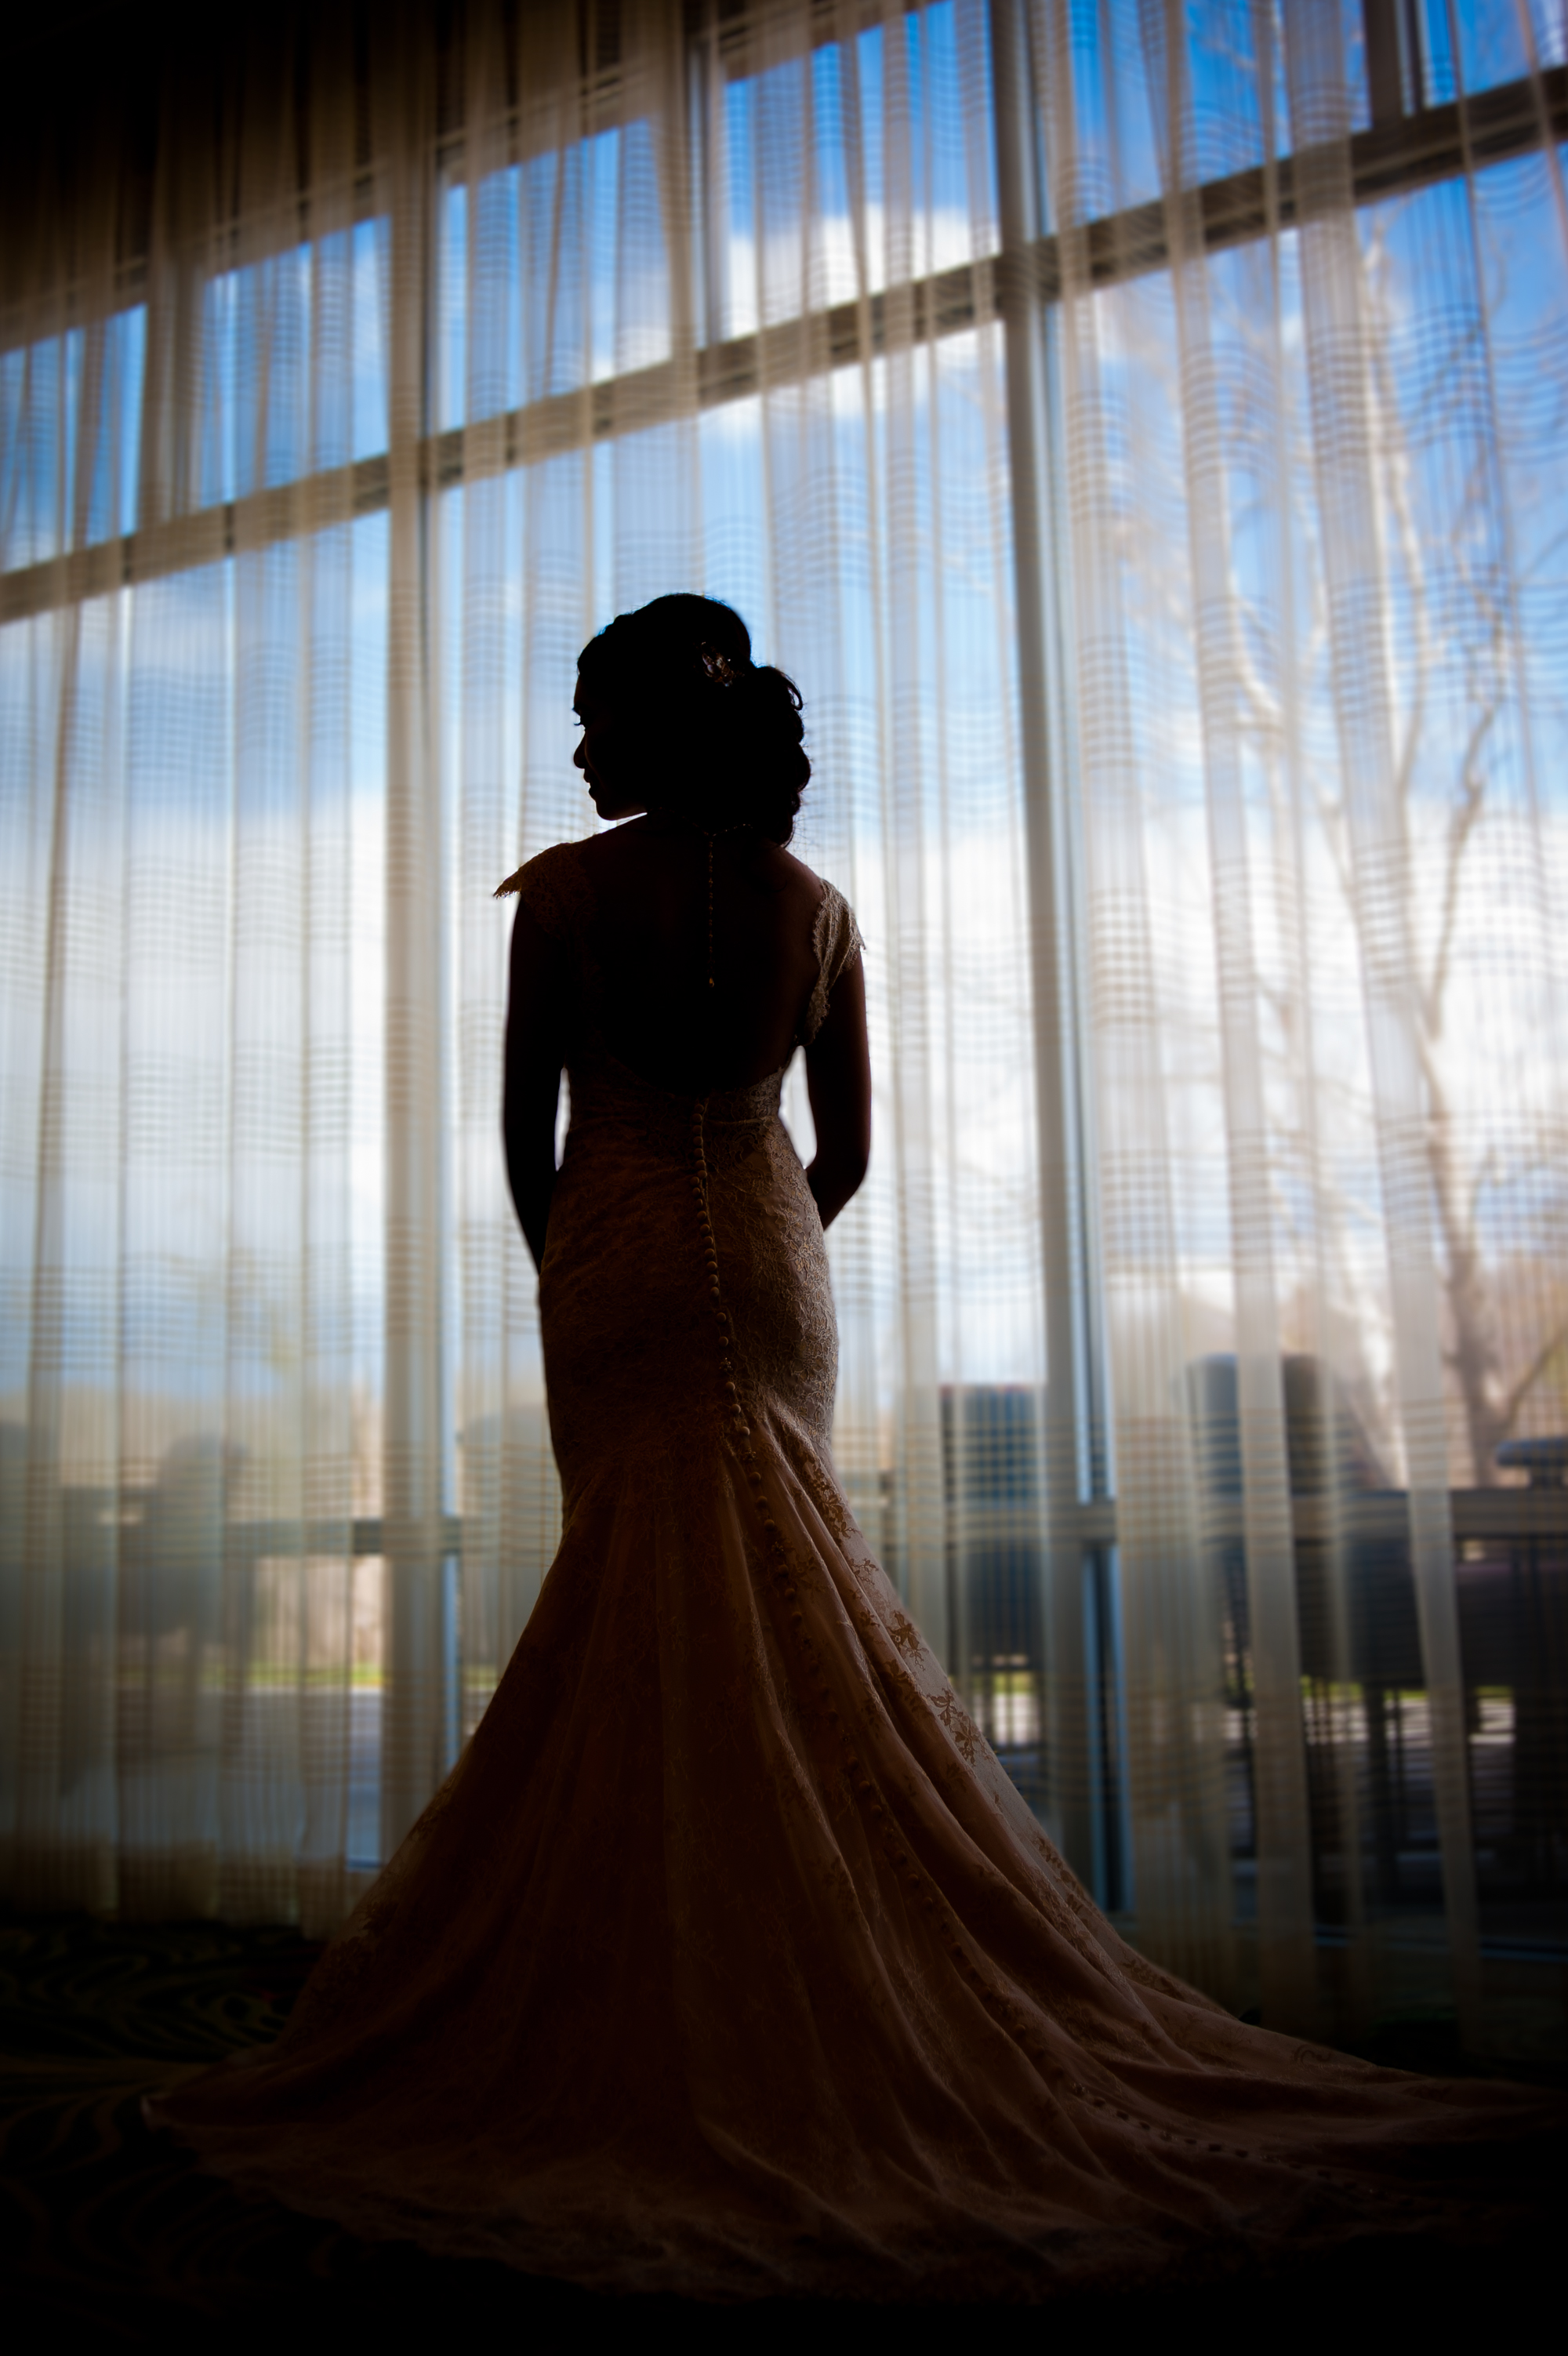 bride silhouet in asheville hotel window